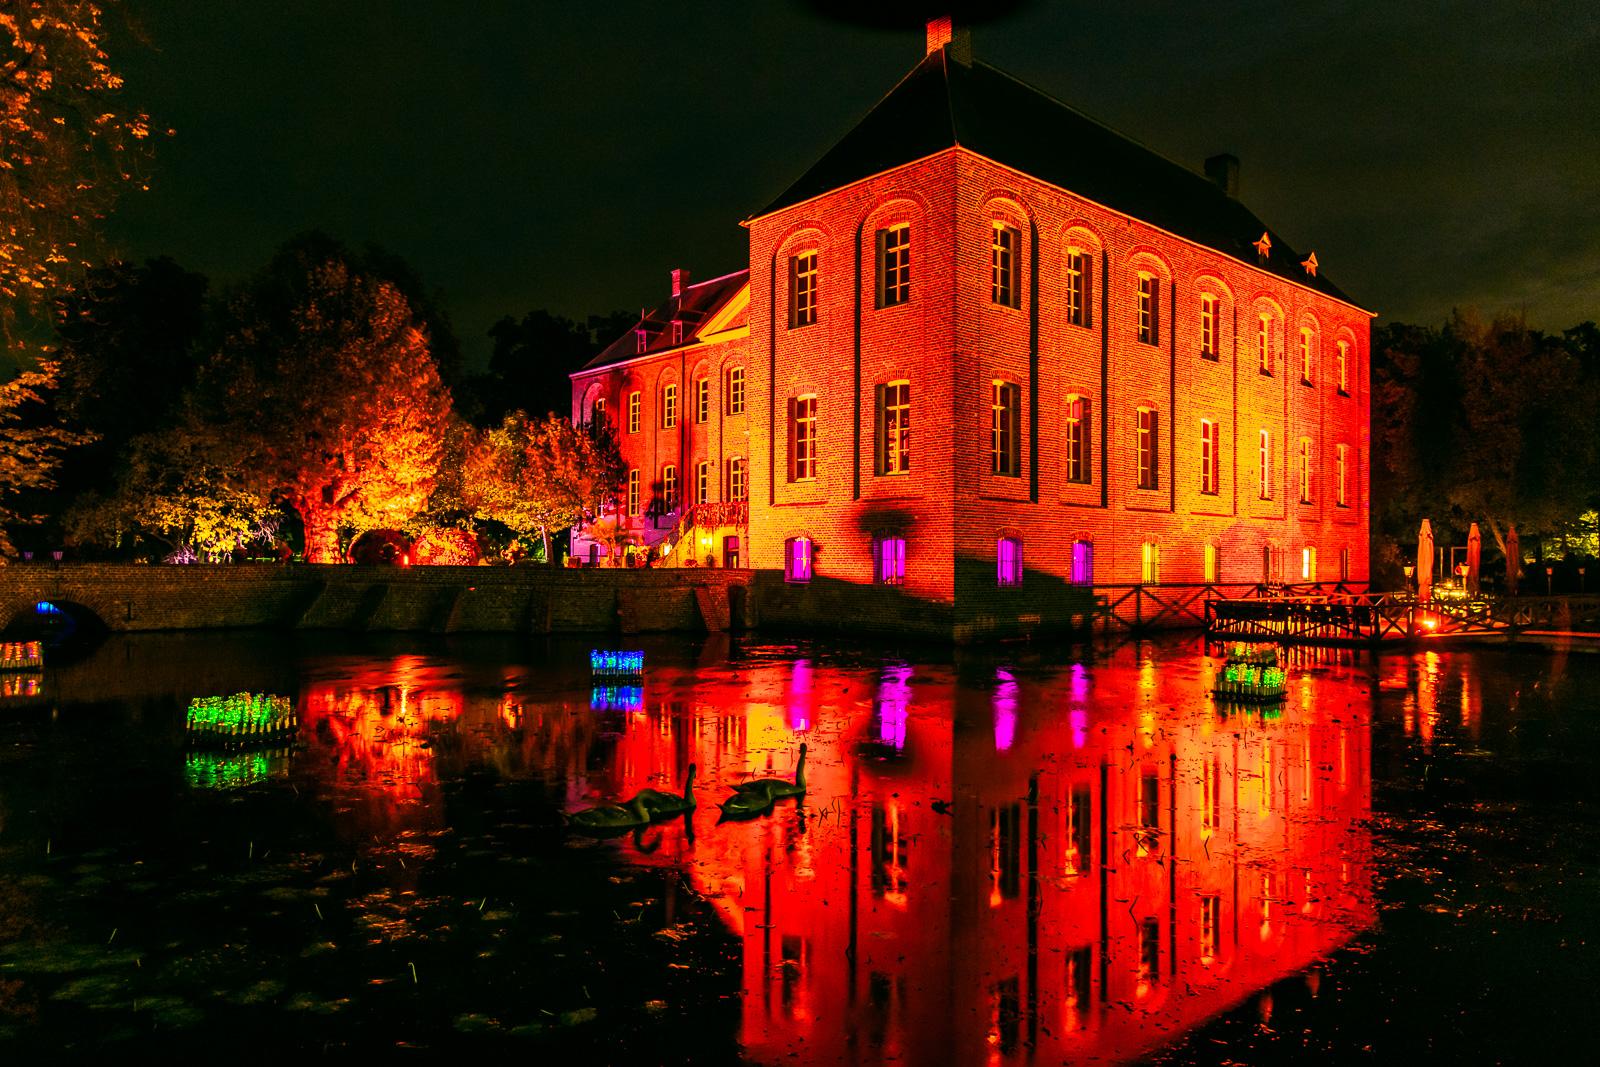 Tickets Lichtkunstfestival Enchanted Gardens vanaf nu te koop!